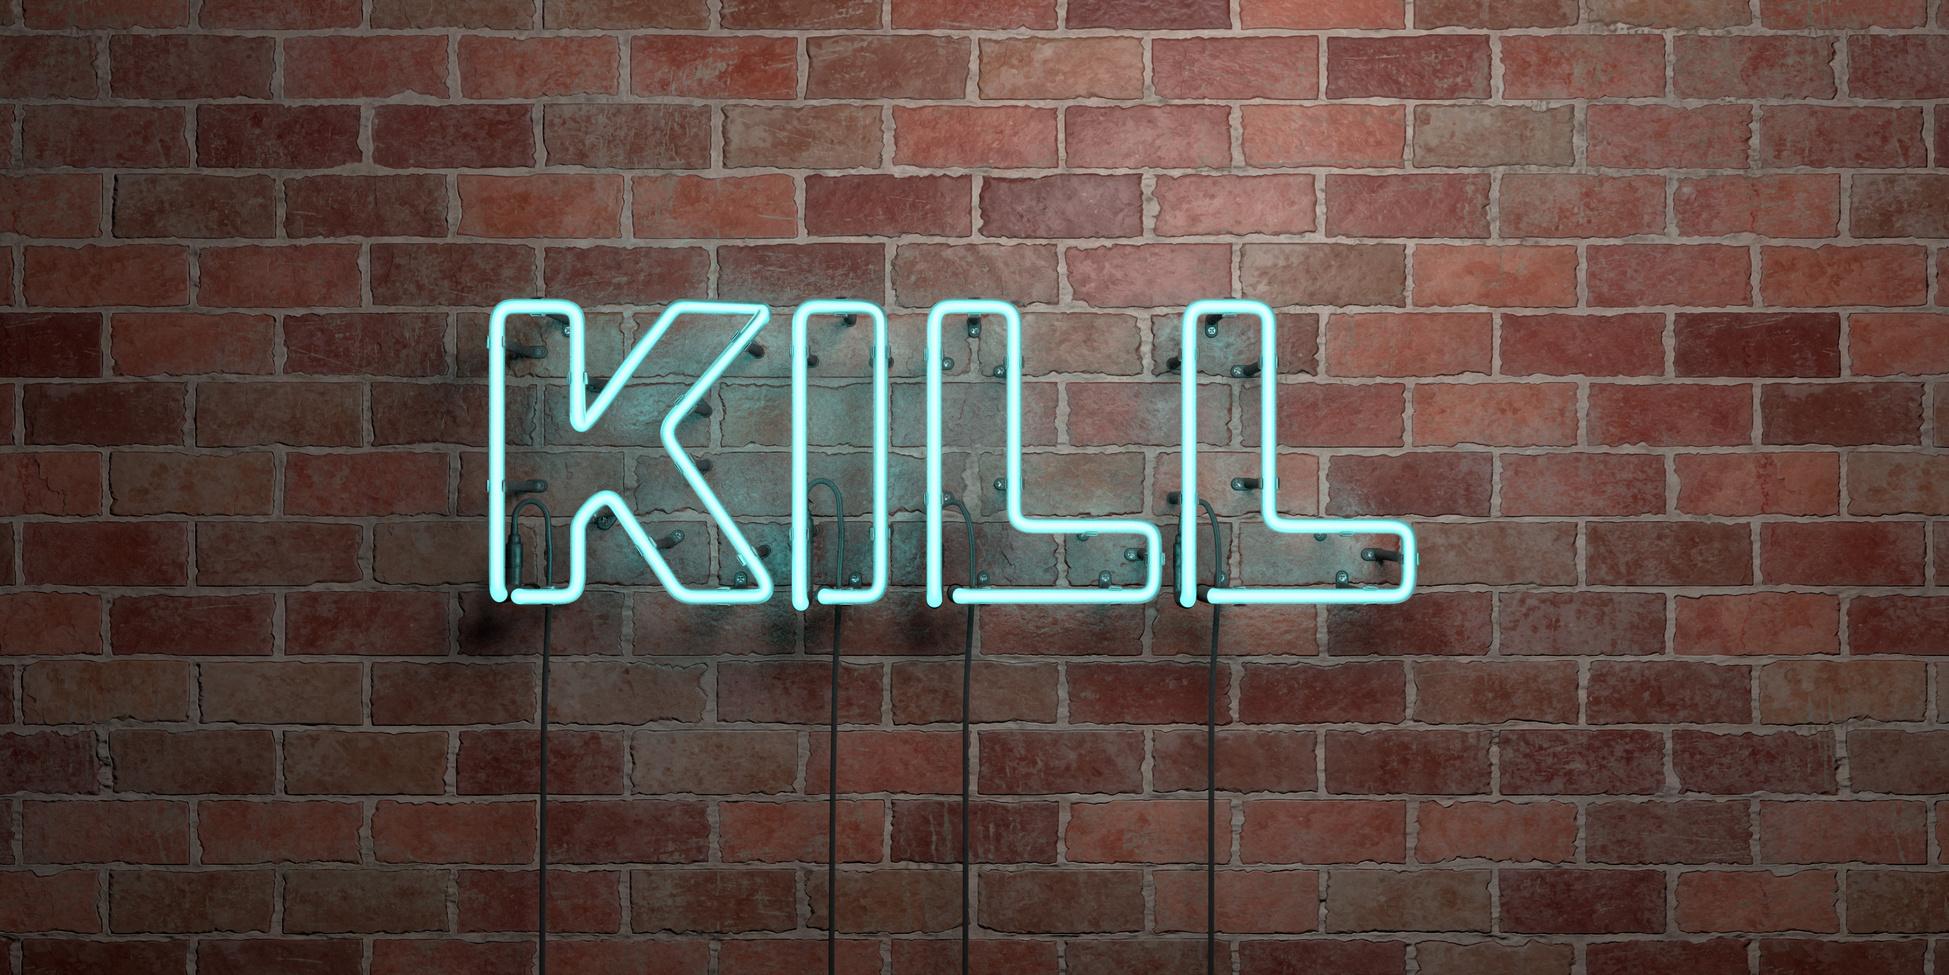 Do we need to kill screen scraping?